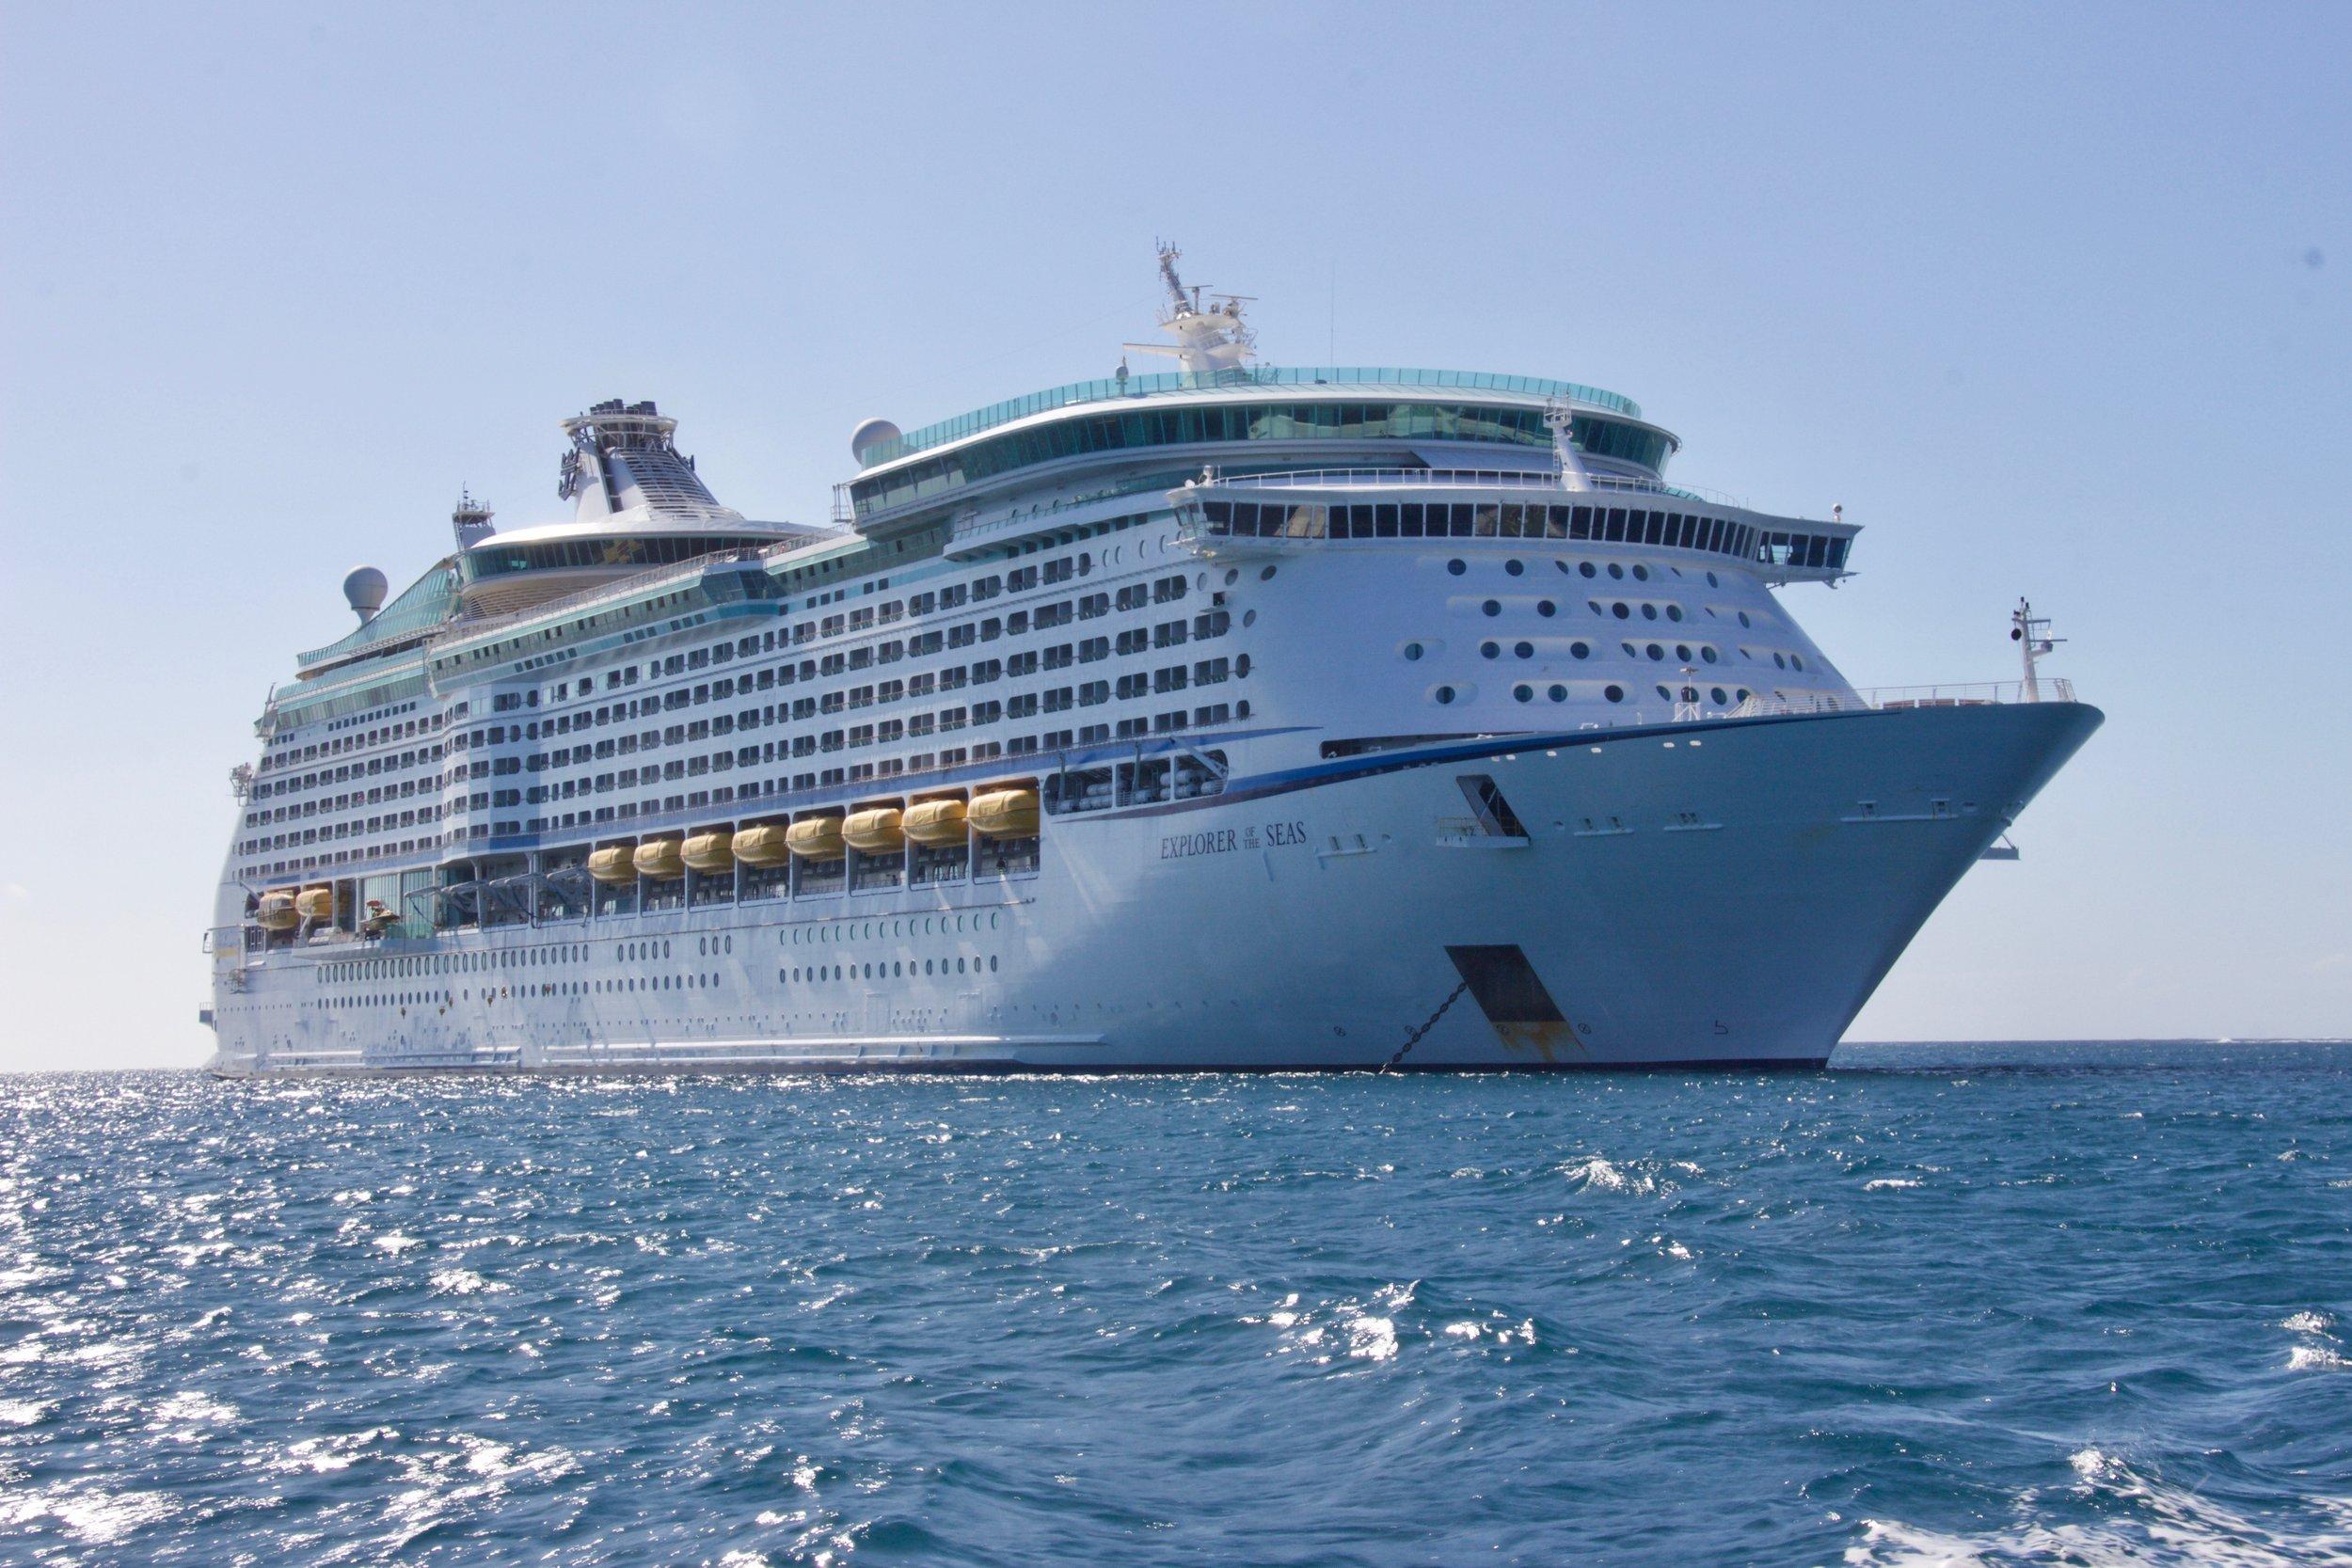 clouds-cruise-cruise-ship-813011.jpg